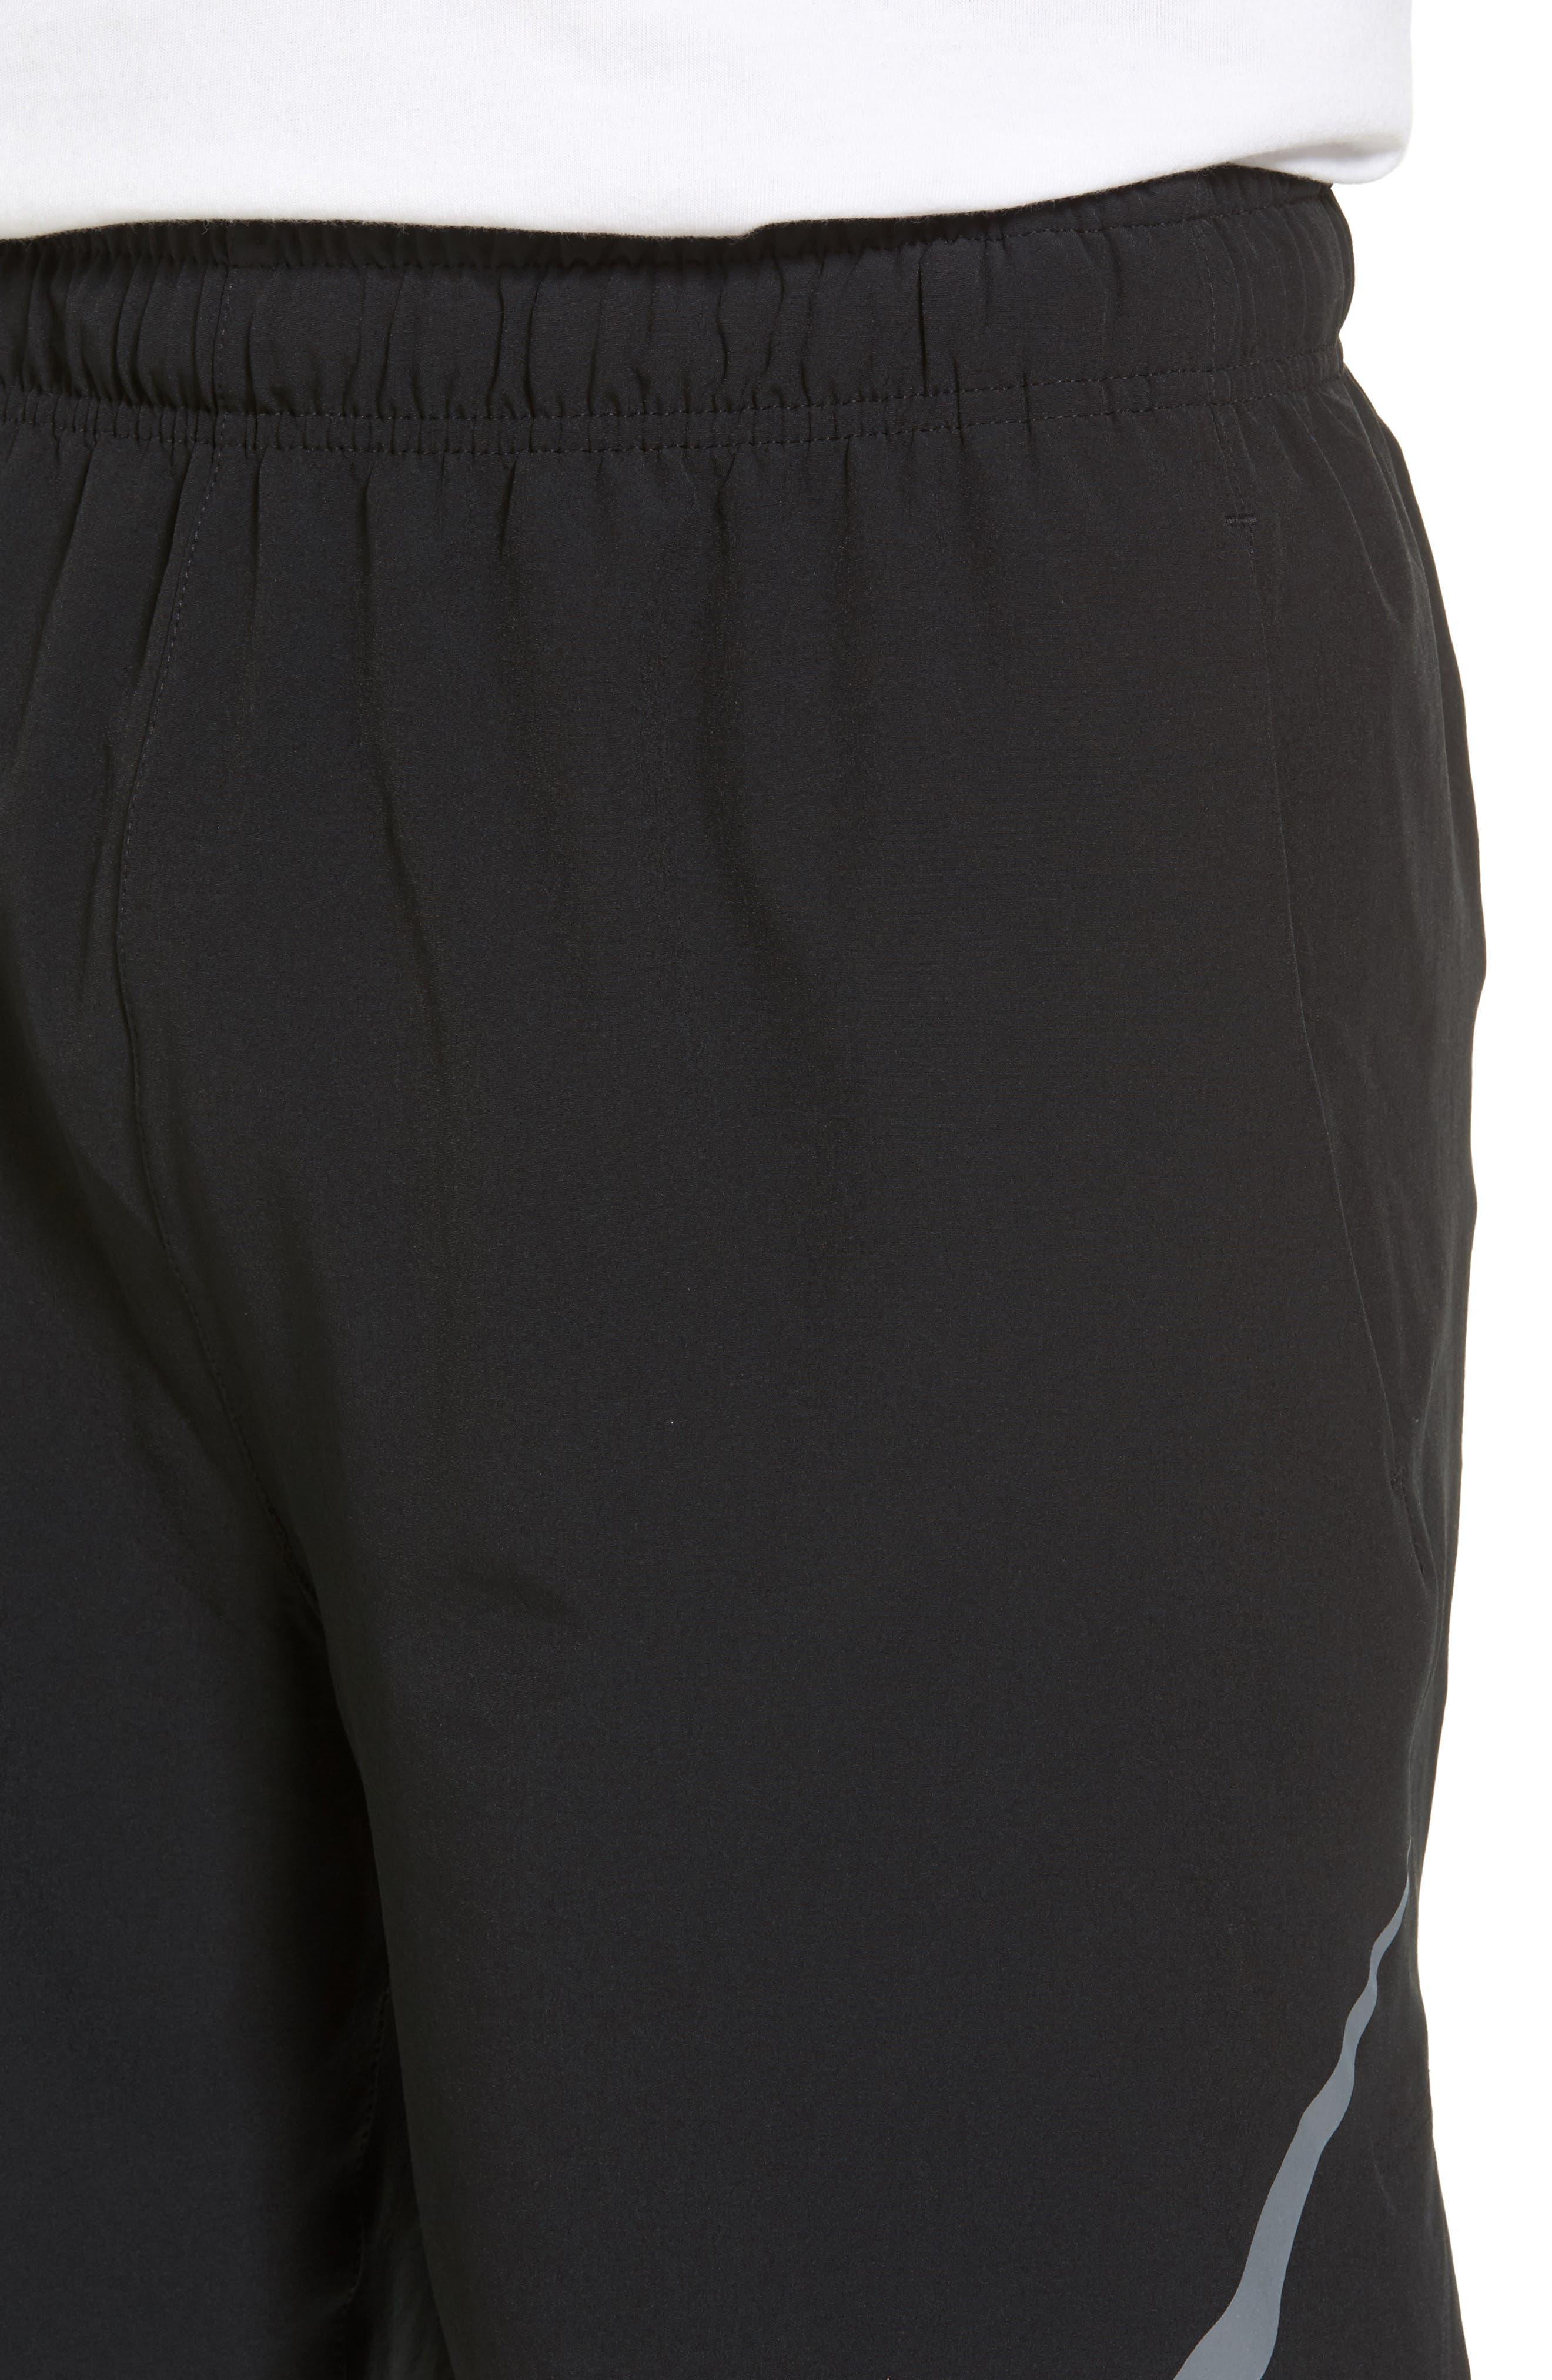 Flex Training Shorts,                             Alternate thumbnail 4, color,                             Black/ Cool Grey